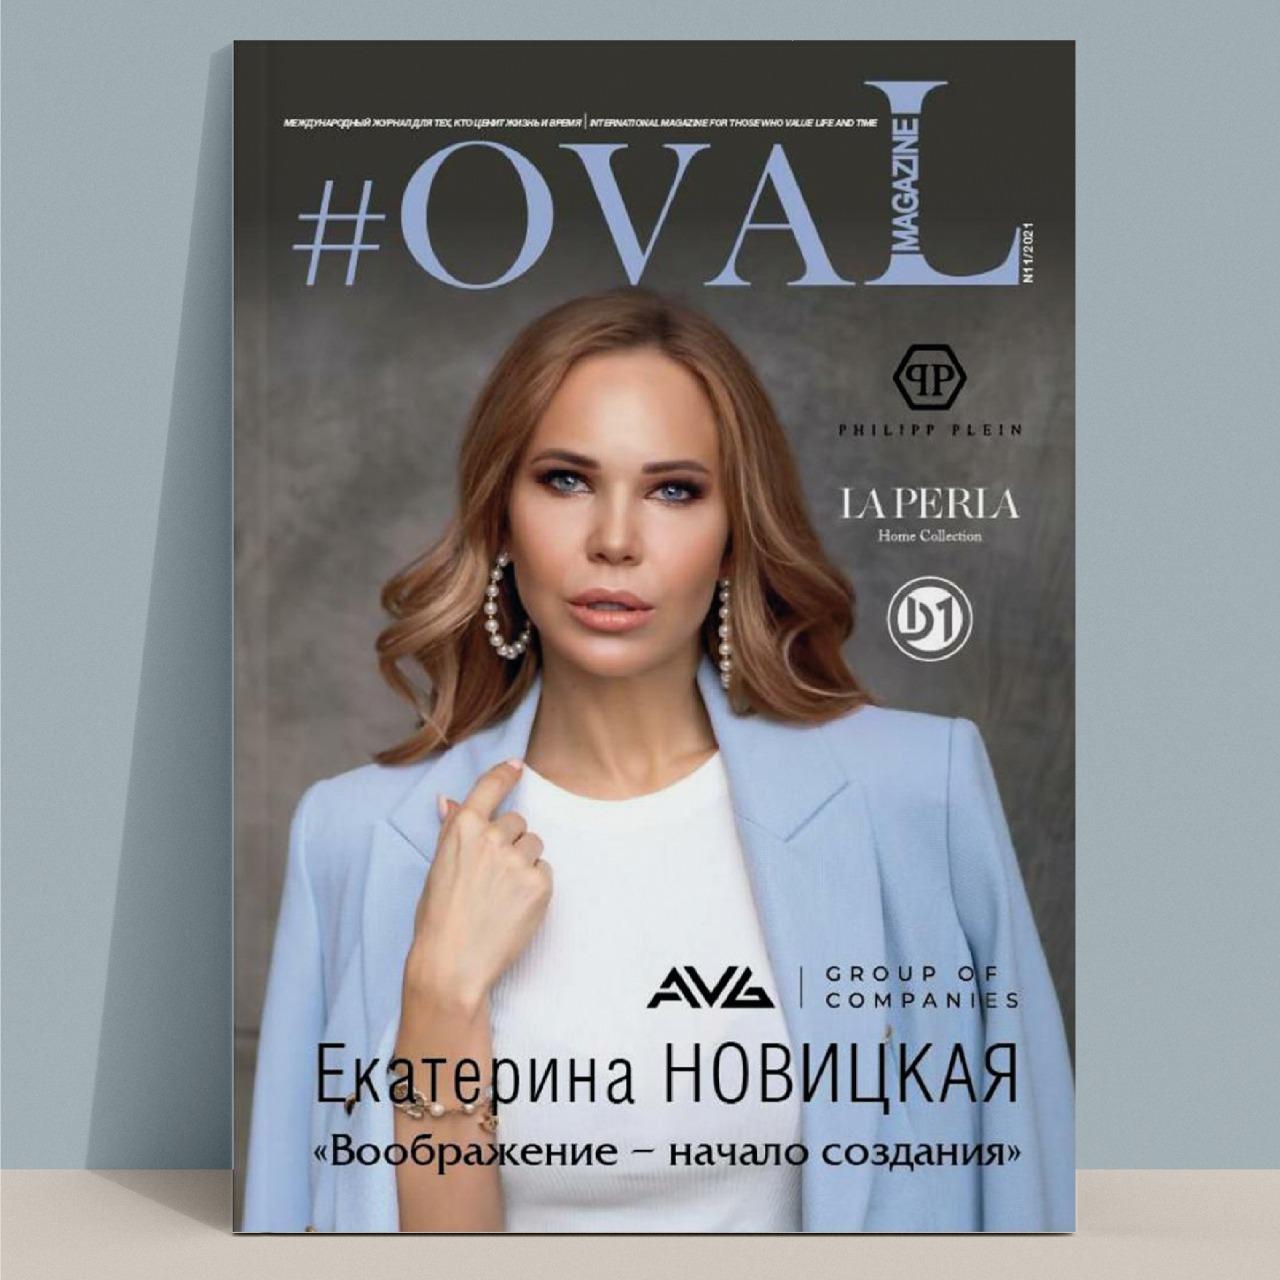 AVG Group Екатерина Новицкая